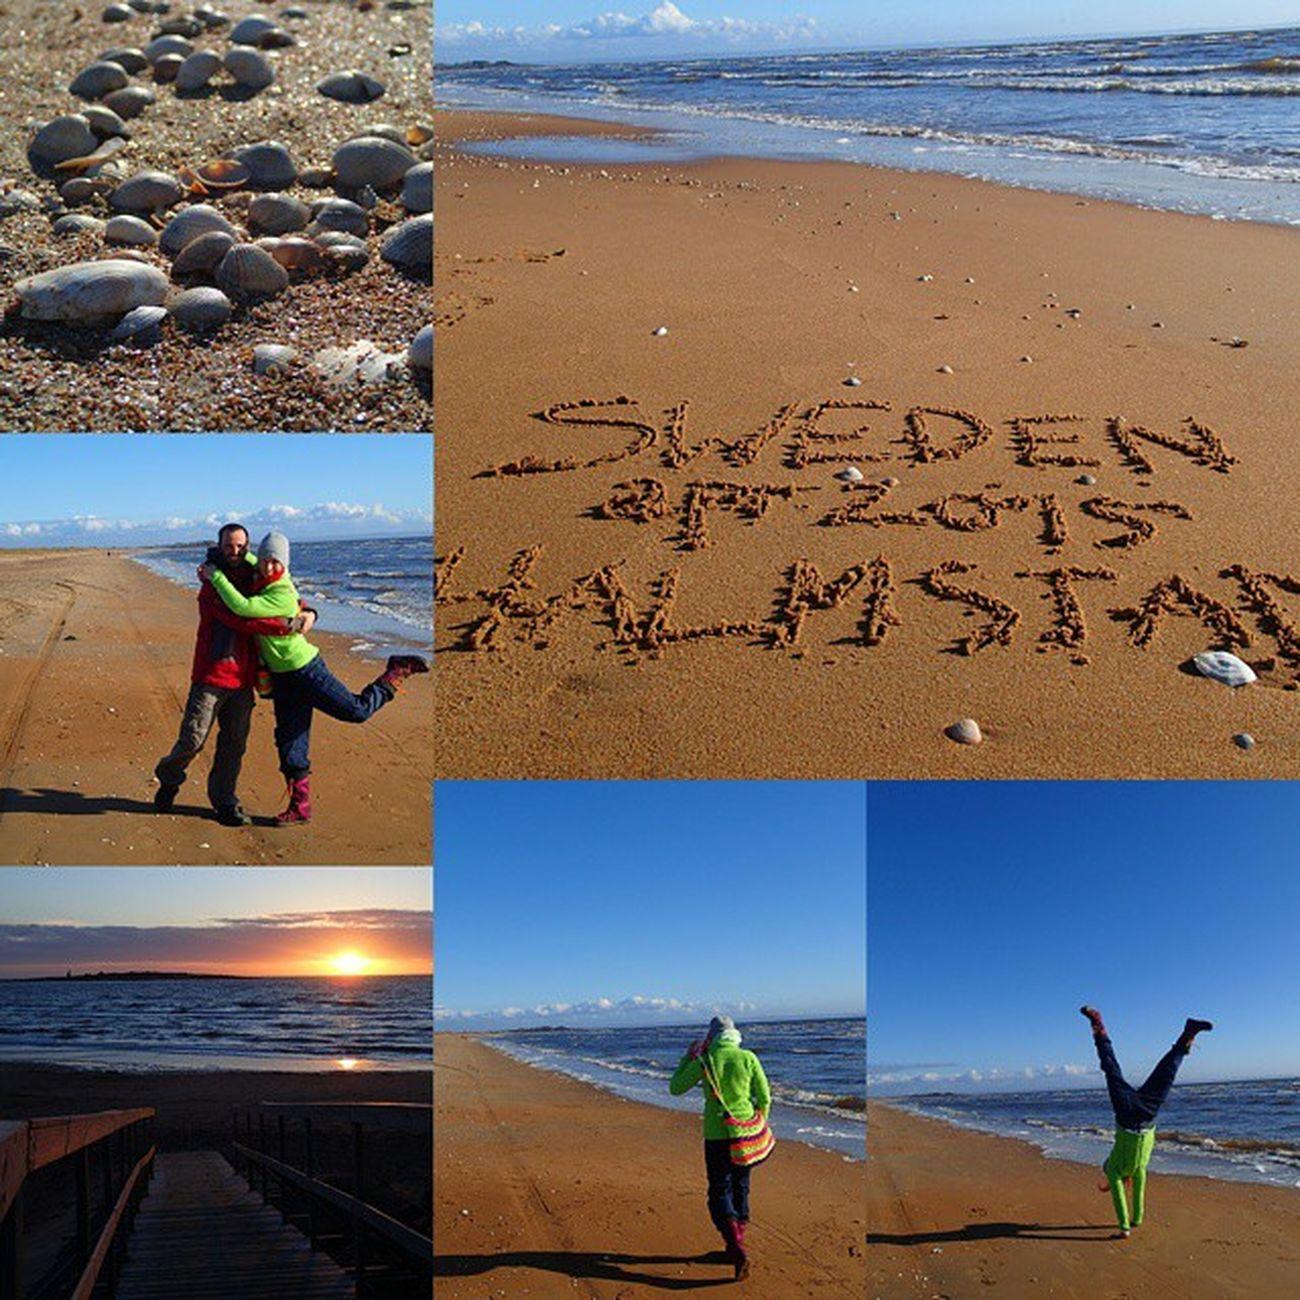 Halmstad Swerige Sweden Wu_sweden Wu_europe Igscandinavia Igsweden Ig_sweden Ig_world Igersbestshot Ig_neverstopexploring Keeponsmiling Lifeisgood Ig_wildplace Ig_exquisite Igglobalclub Maxjoy Loves_united_europe Loves_sweden Loves_natura Seaside Norrona SOREL Radgirlslife Amazingcolors travelgram travelling backpacking PerFeCt daY iN haLmsTad▶expLoriNg arOuNd 🚣🚤🌊🌊🌊